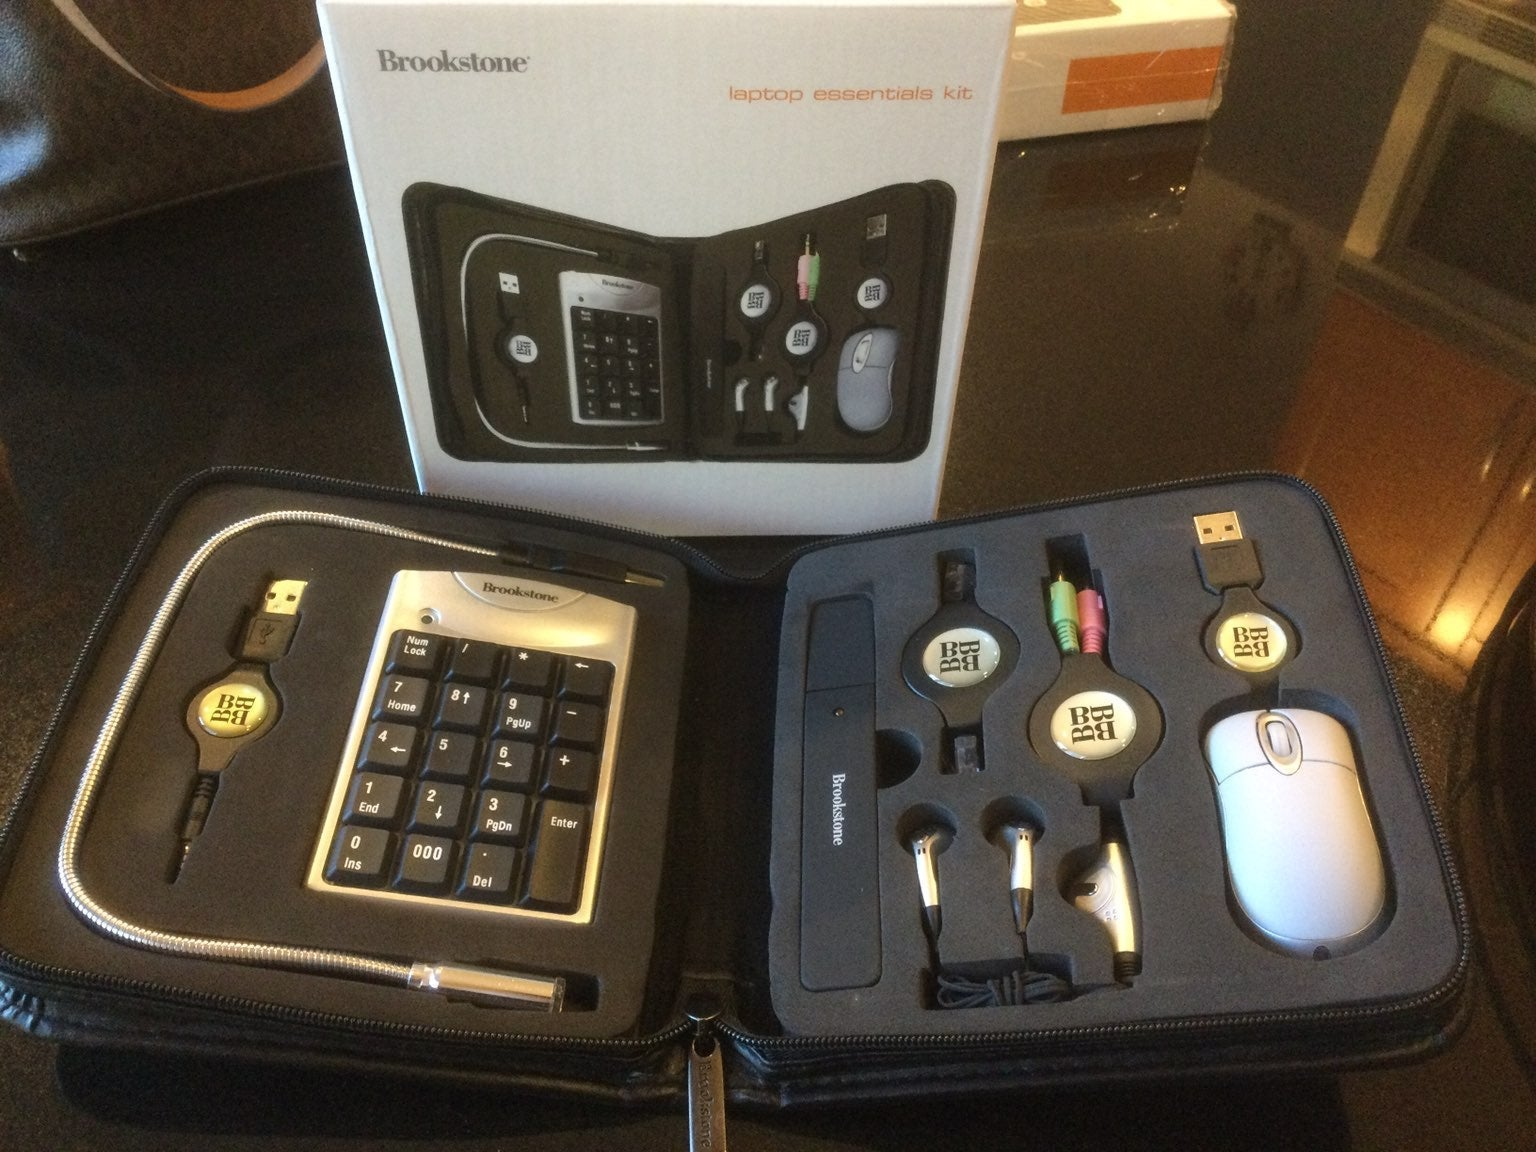 Brookstone laptop essentials kit NEW